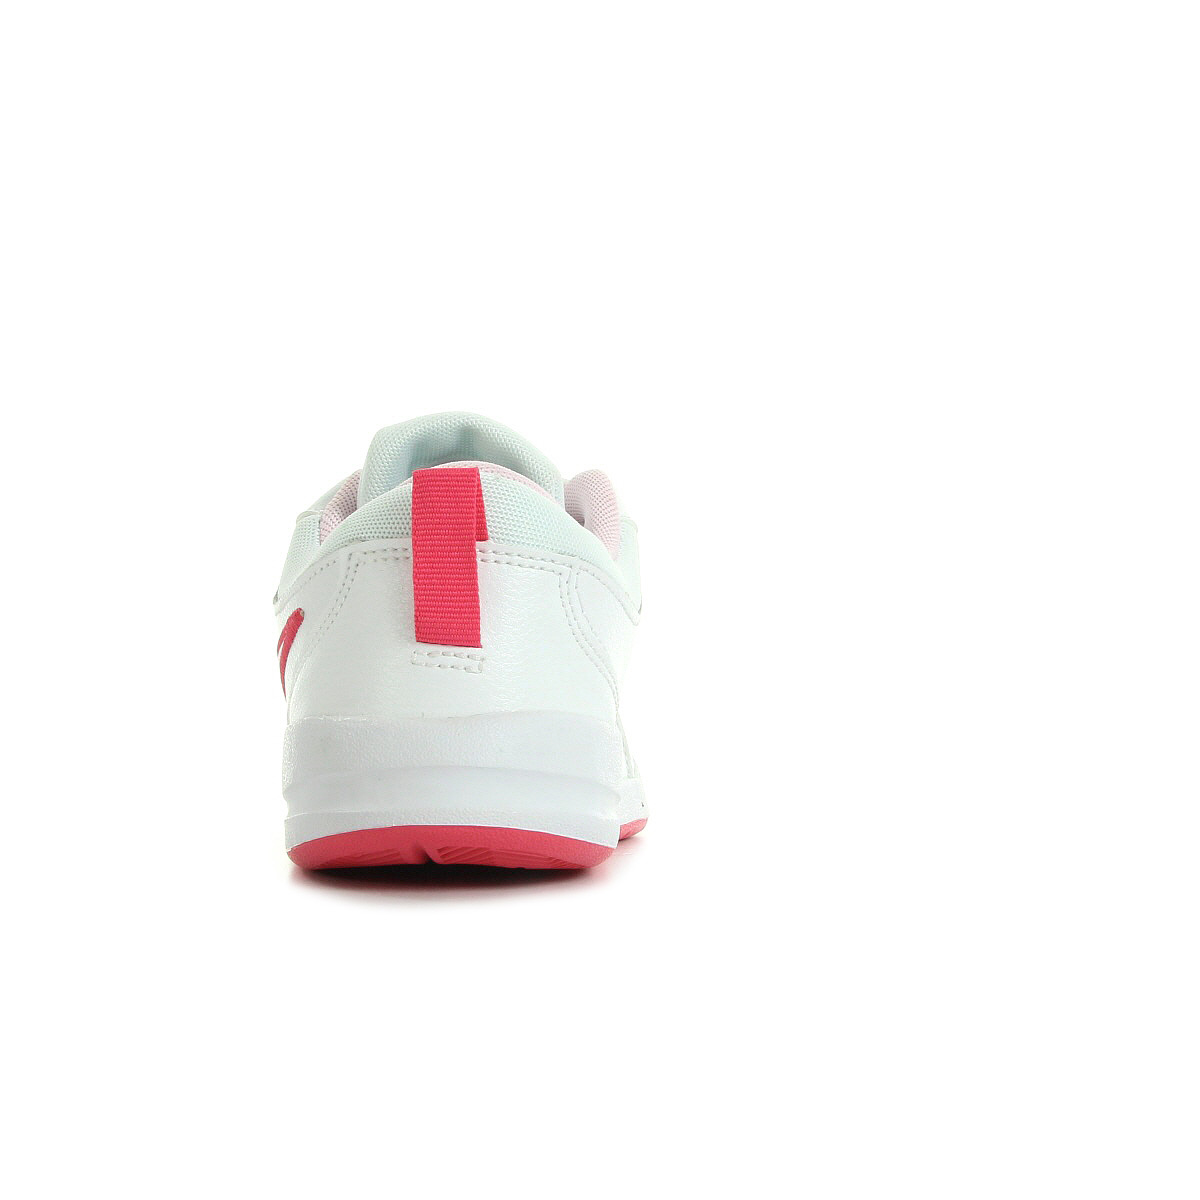 nike air max 99 - Chaussures Baskets Nike fille Pico 4 taille Blanc Blanche Cuir ...